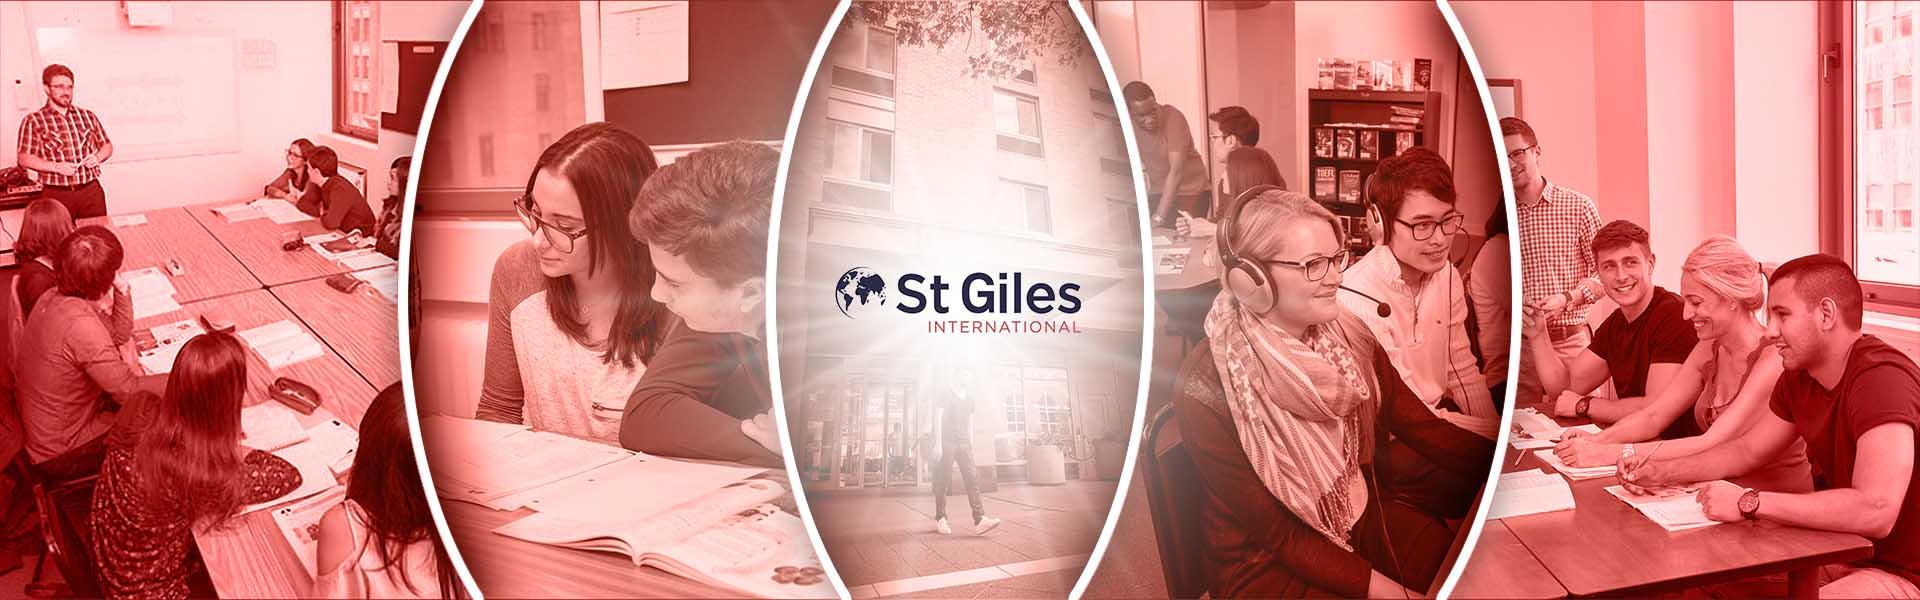 St Giles New York Dil Okulu